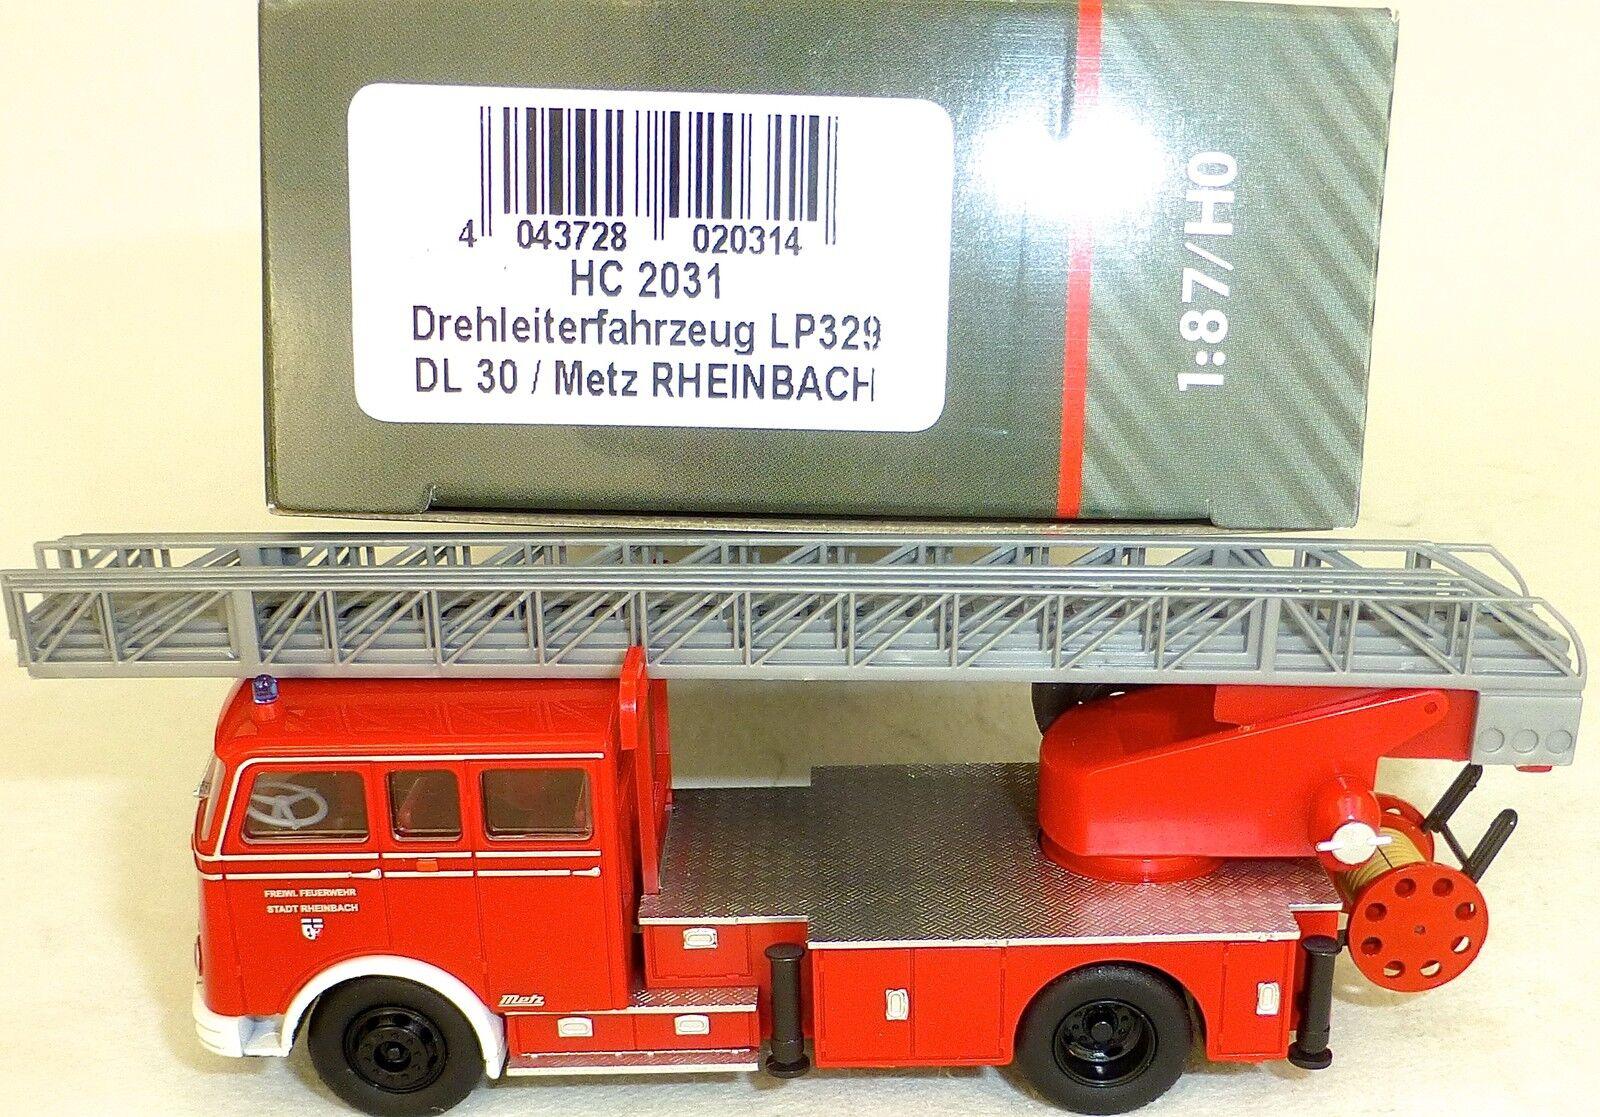 Drehleiter véhicule lp329 dl30 Metz rheinbach rheinbach rheinbach Heico hc2031 OVP NOUVEAU μ d7cdf6